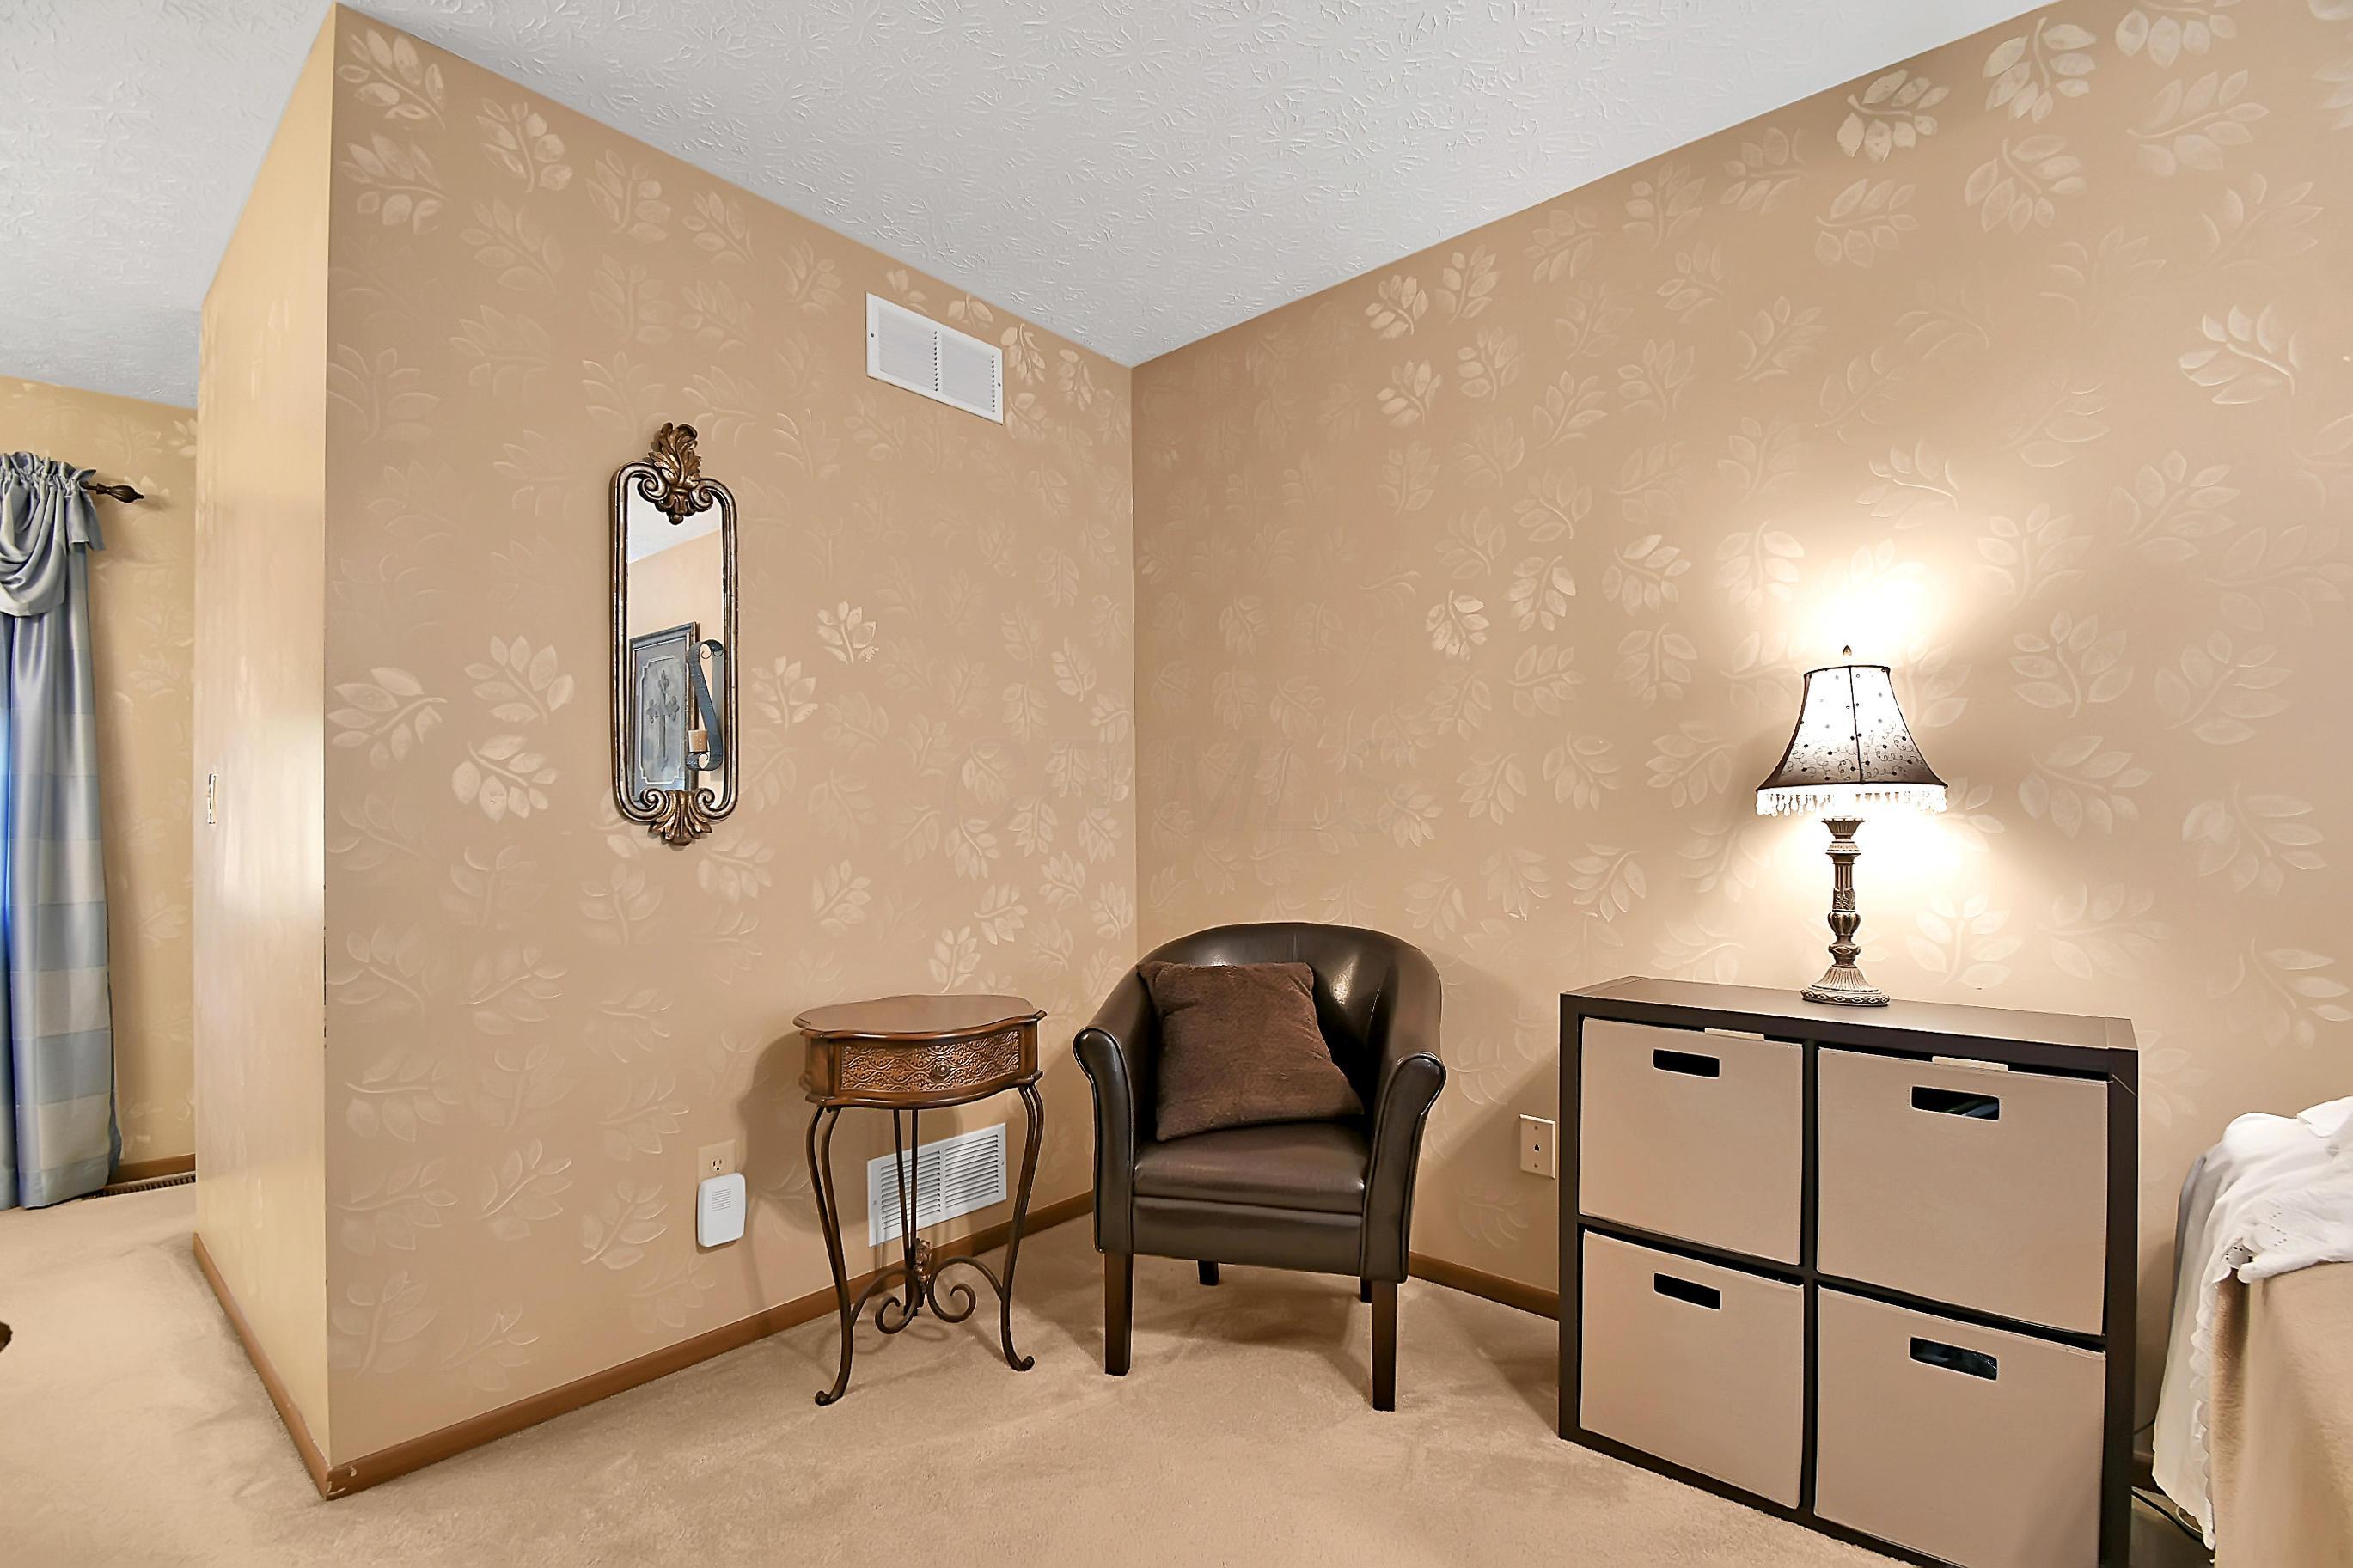 1003 Welwyn Drive, Westerville, Ohio 43081, 4 Bedrooms Bedrooms, ,3 BathroomsBathrooms,Residential,For Sale,Welwyn,220031145